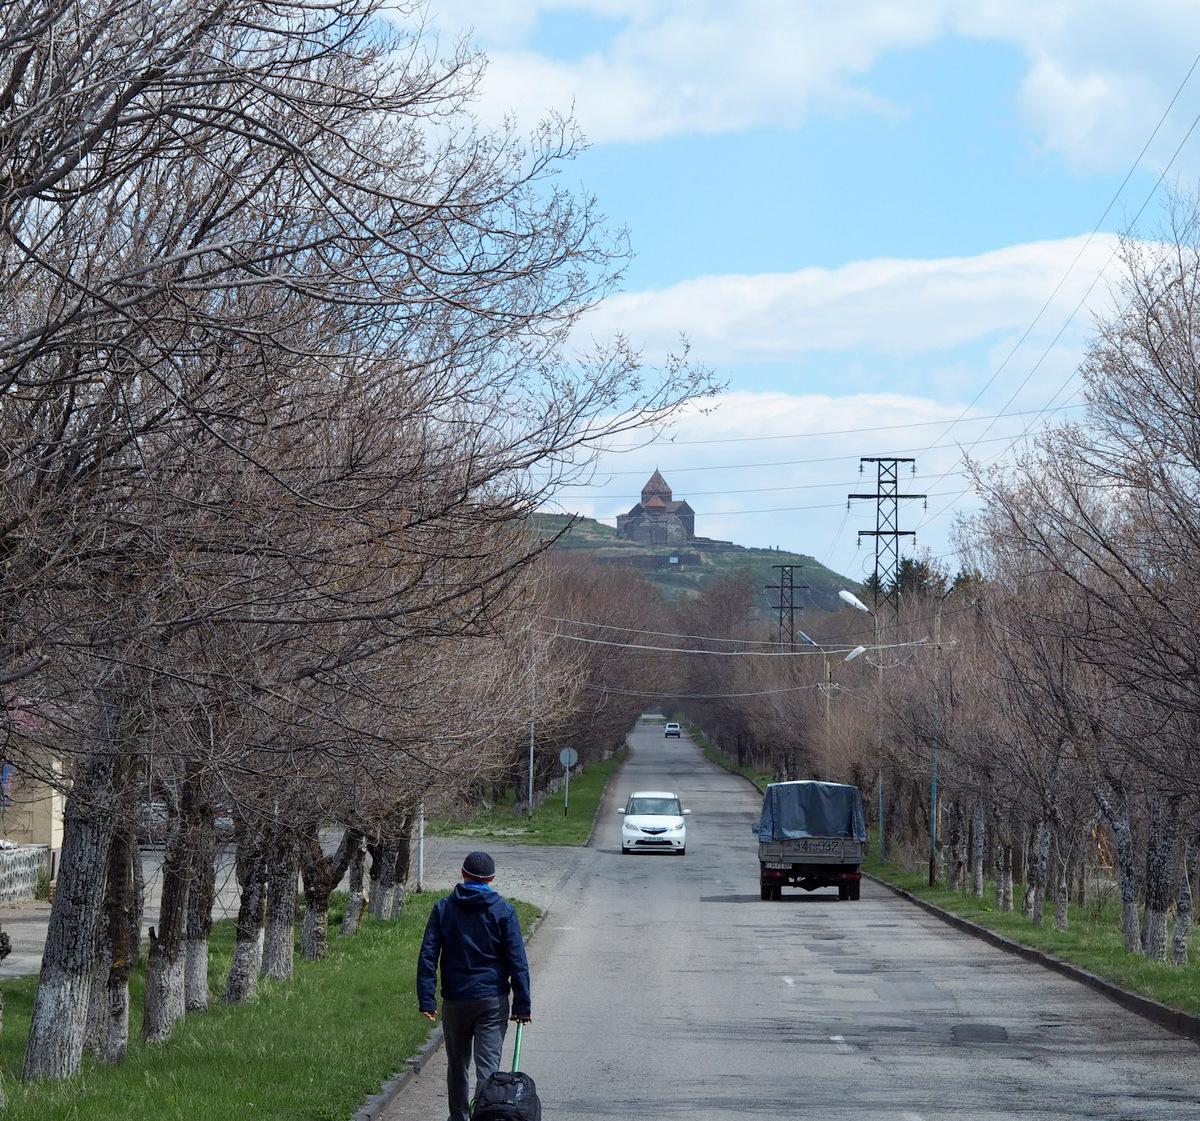 Gruzja-Armenia-Iran-Stambuł. Swoją drogą... 5